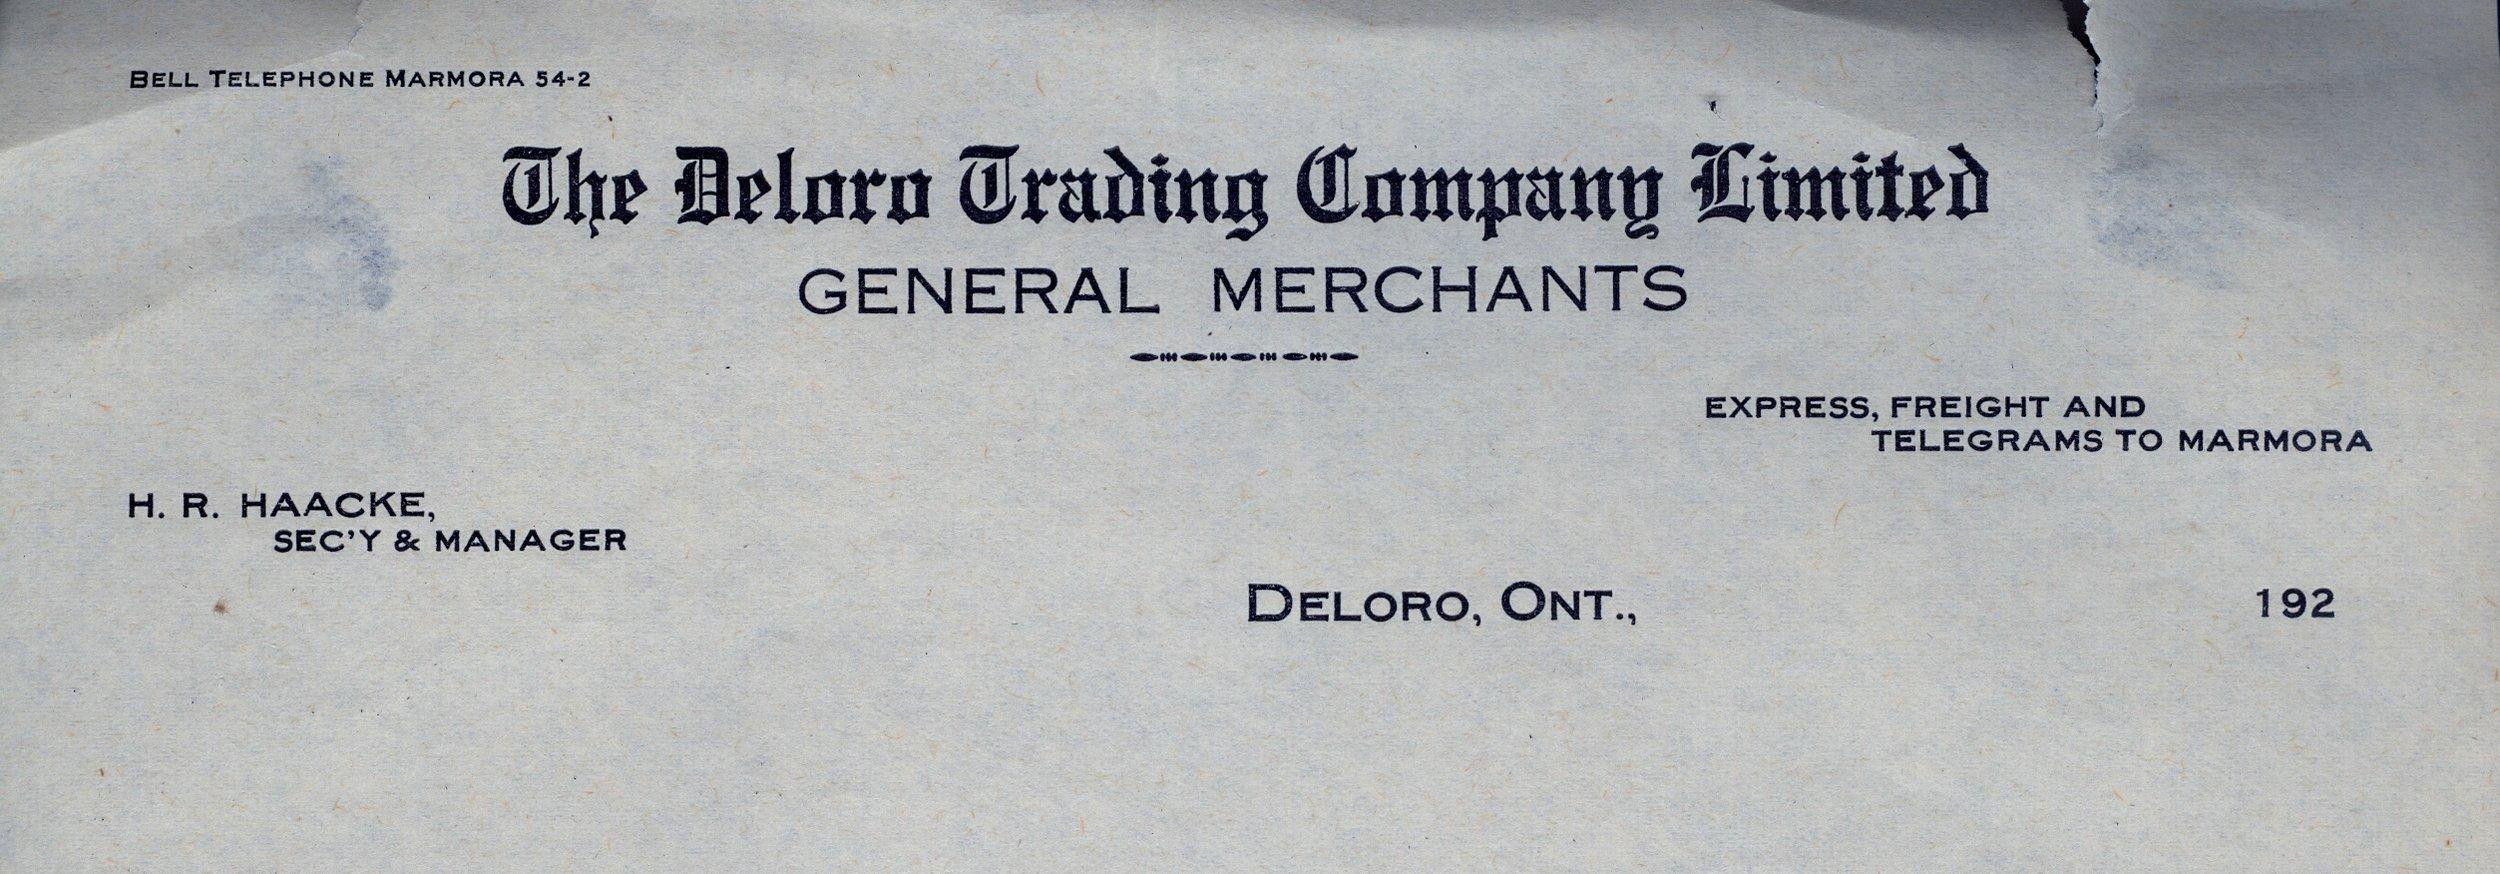 Deloro Trading Co. Letterhead.jpg